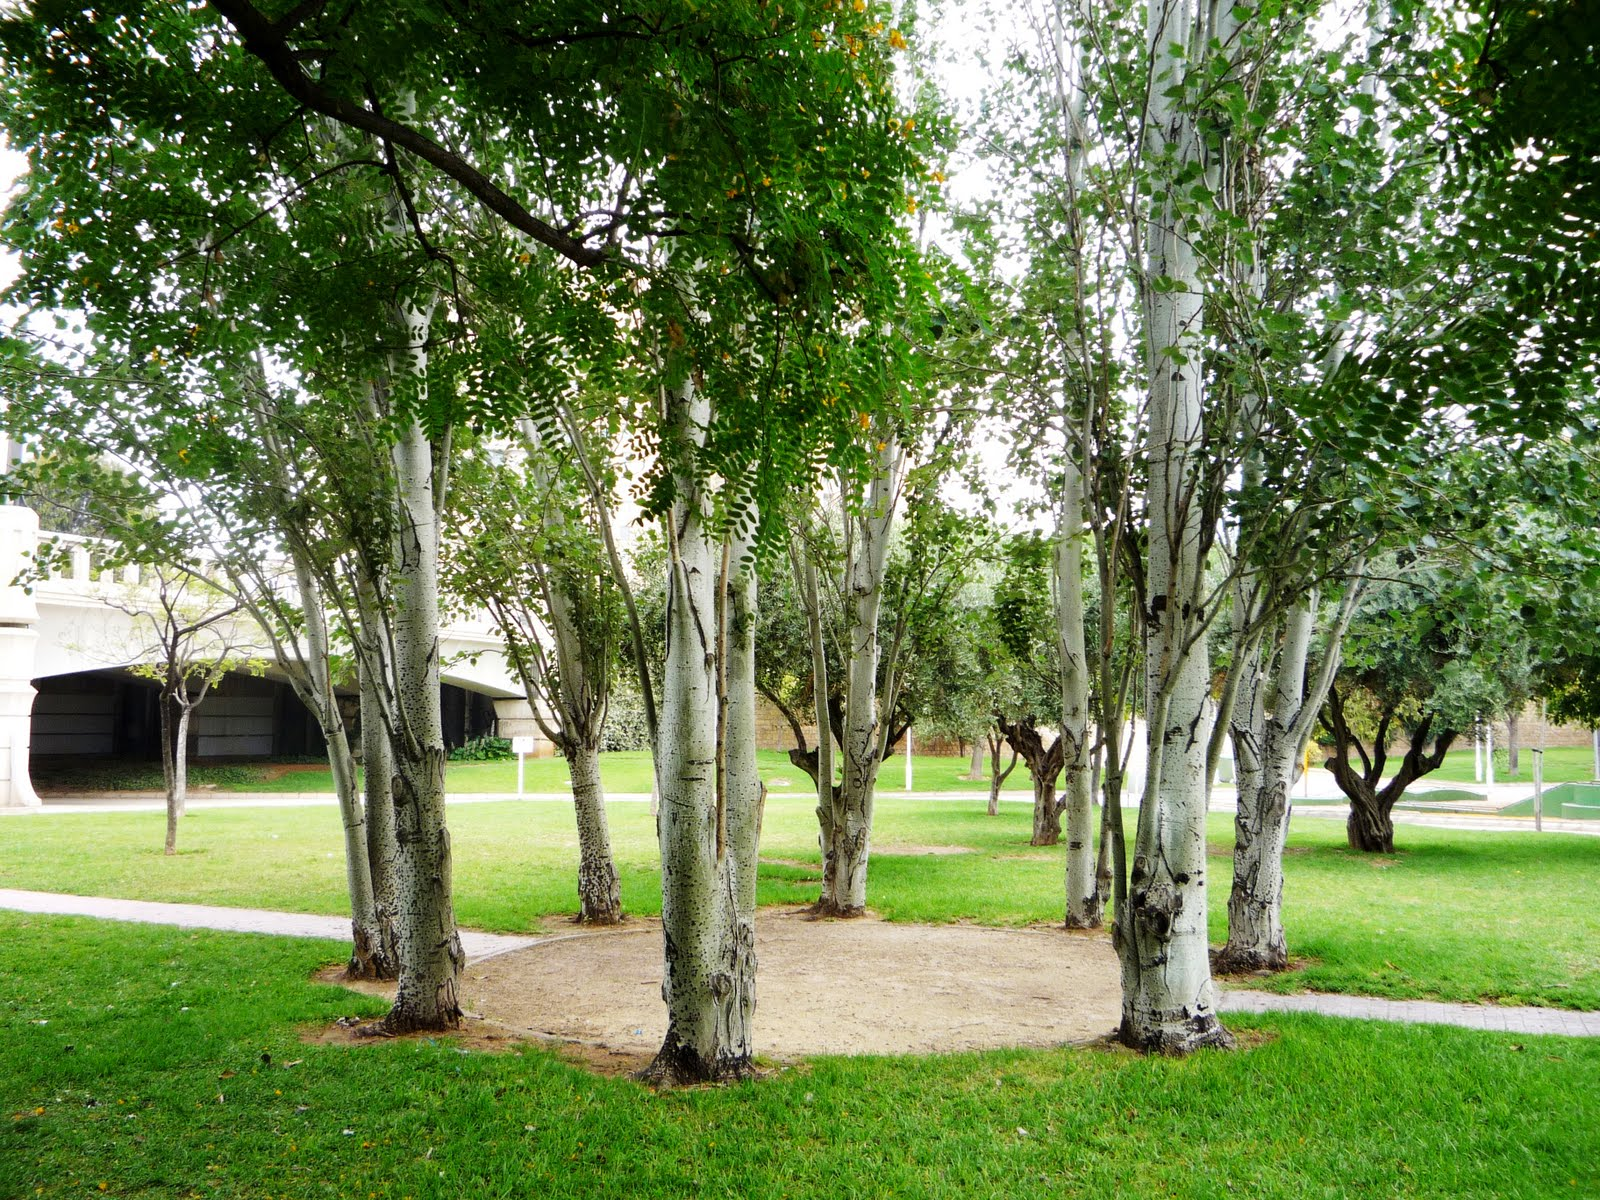 Valencia jardines del r o turia rboles for Casa con jardin valencia